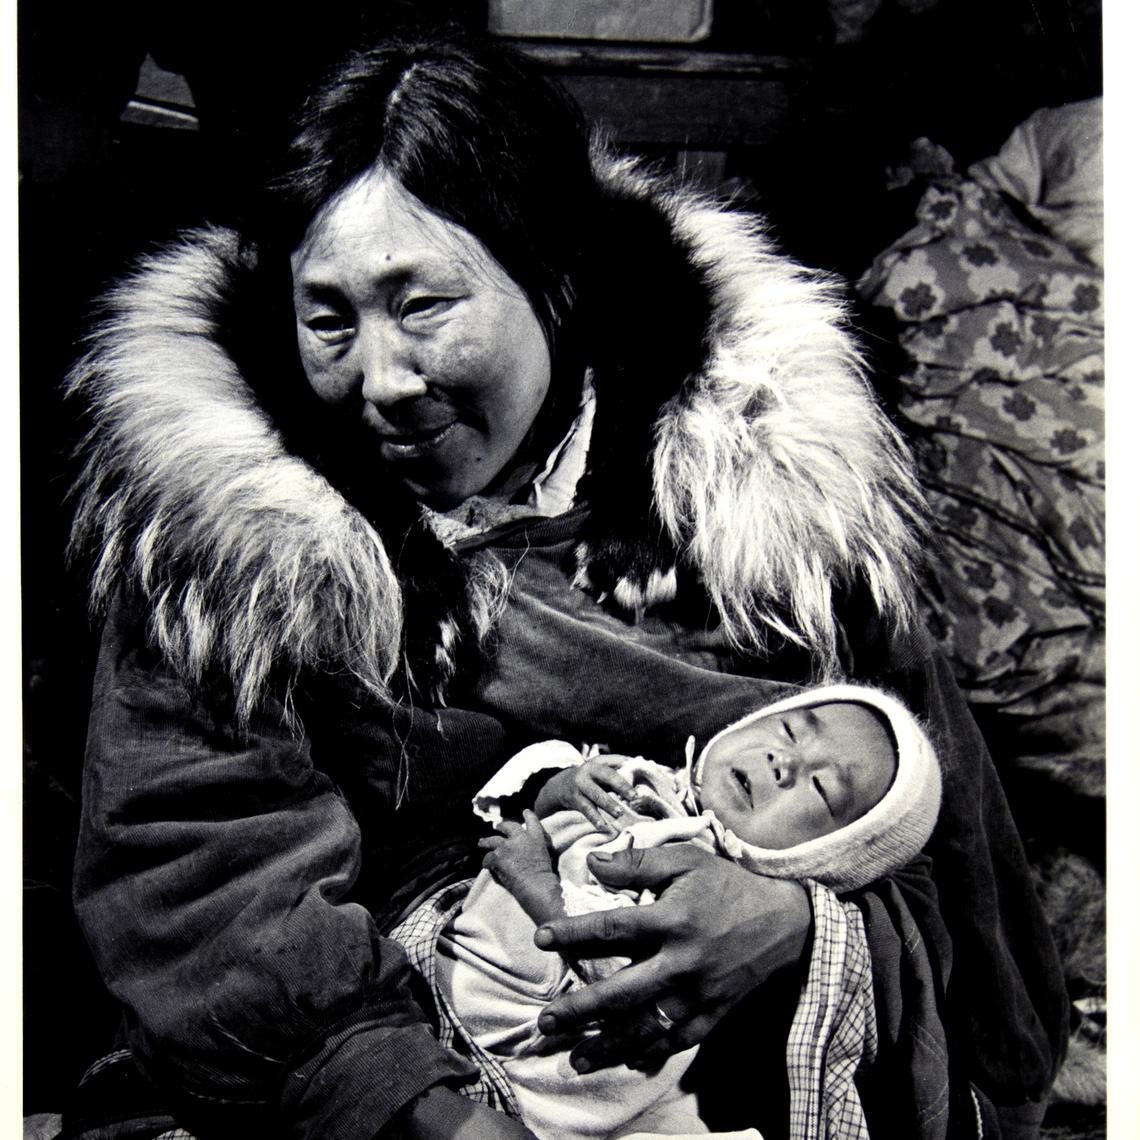 "Burt Glinn (American, 1925–2008). Native American Family–a Nunumaiute mother holding baby, Alaska, 1953. Gelatin silver print, 9 ⅜ x 6 ⅜"". Gift of Dr. Stephen J. and Eileen Nicholas, P'20, BG-192."